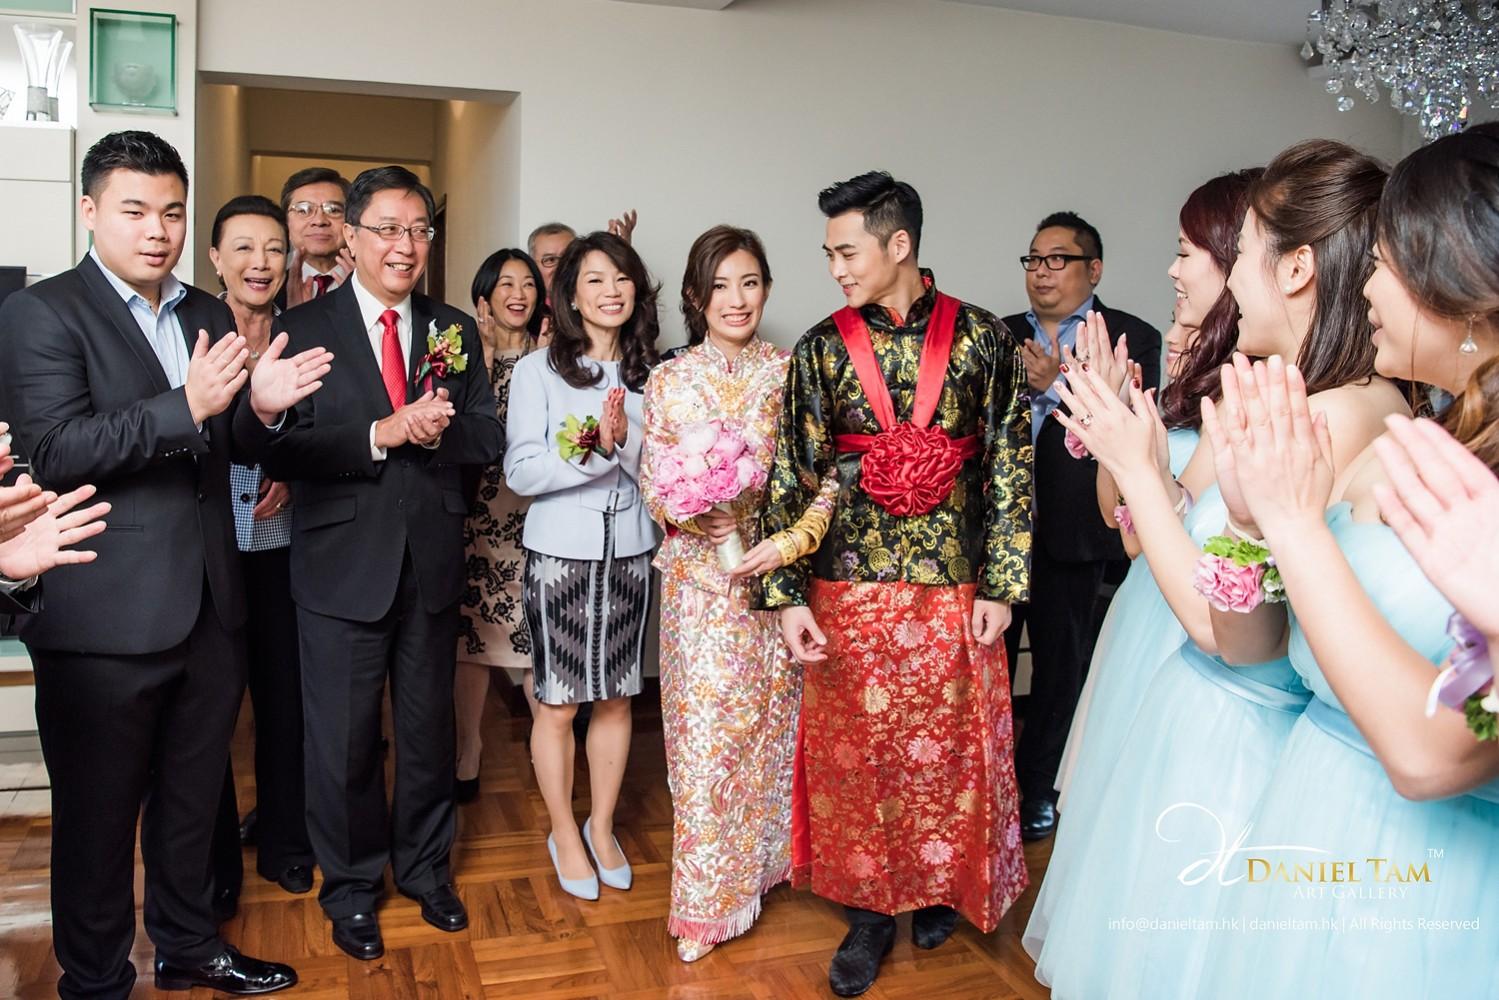 wedding-day-photography-hk-four-seasons-jessica-erik-01wedding-day-photography-hk-four-seasons-jessica-erik-08